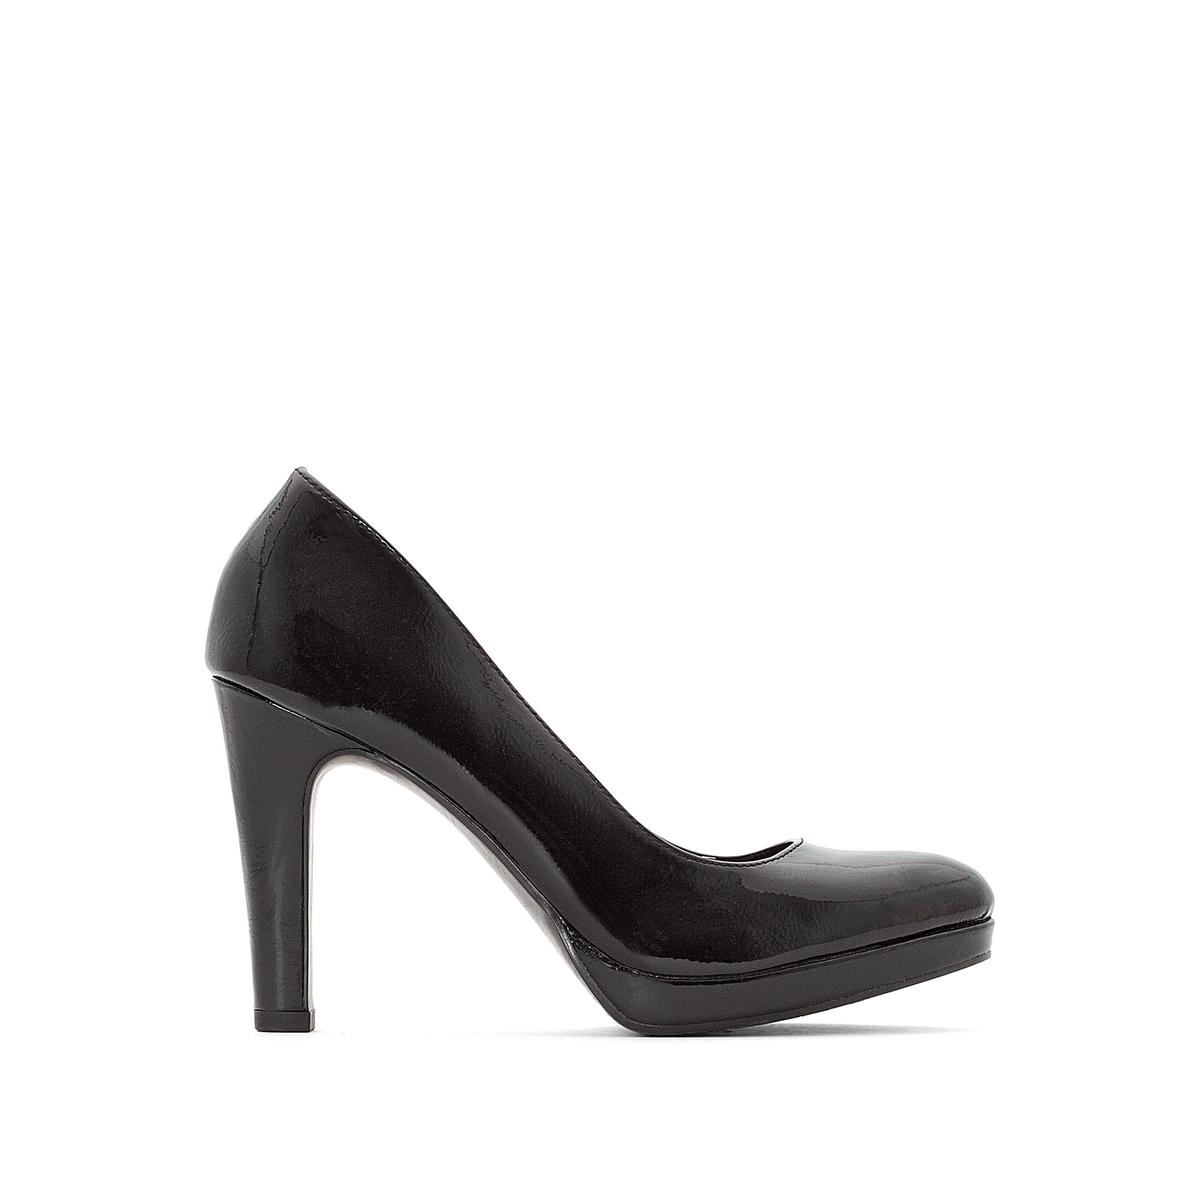 Туфли-лодочки на каблуке-шпильке Lycoris туфли tamaris туфли лодочки